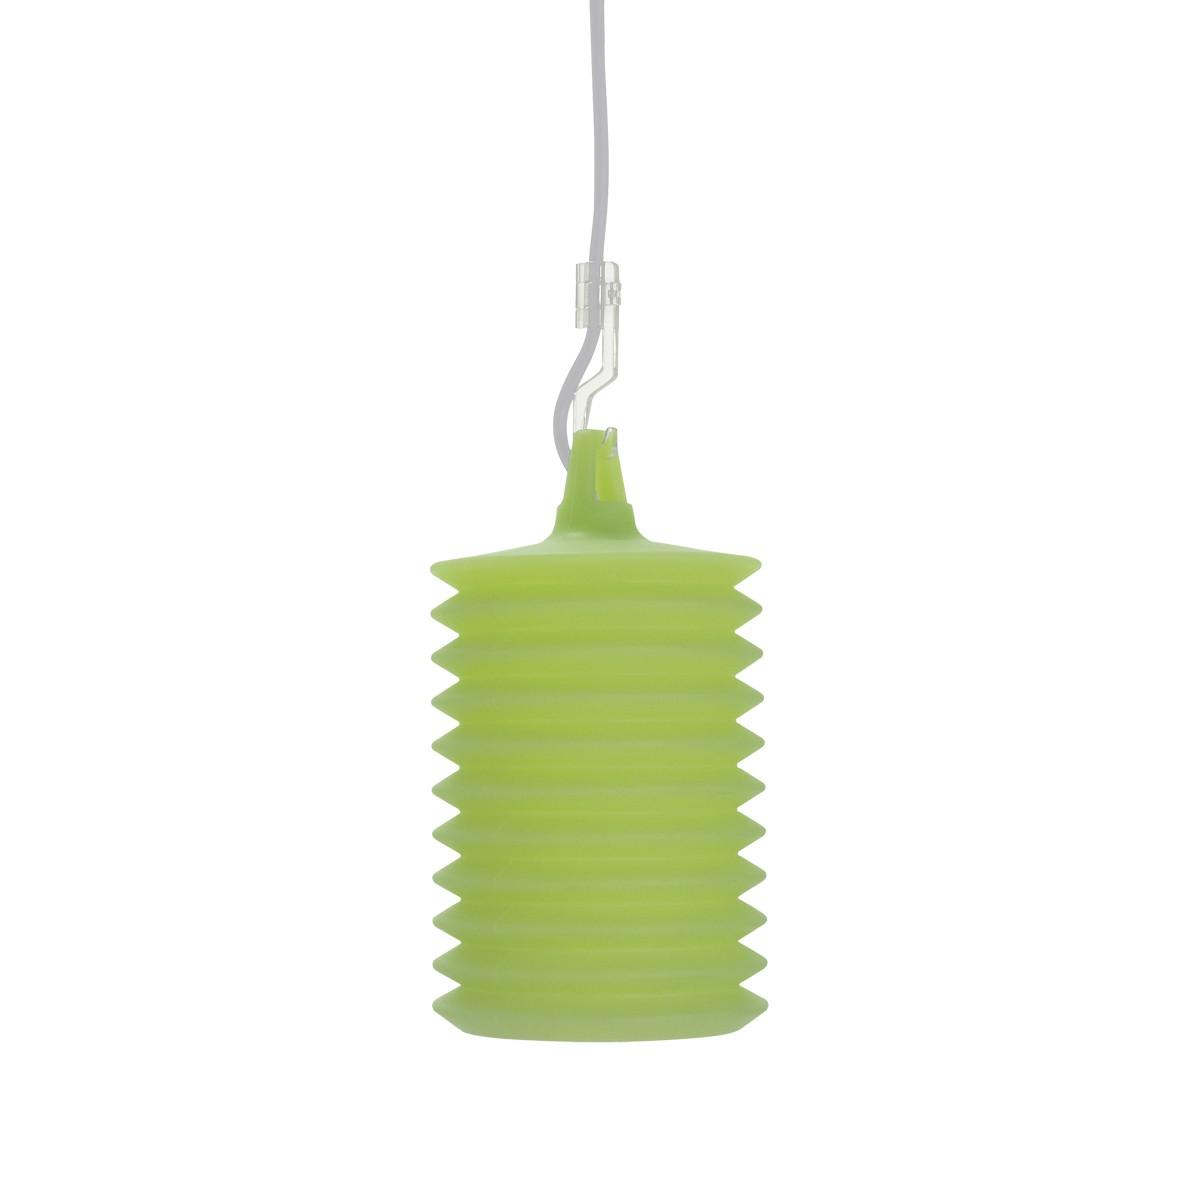 Rotaliana Lampion H1 Pendelleuchte, grün